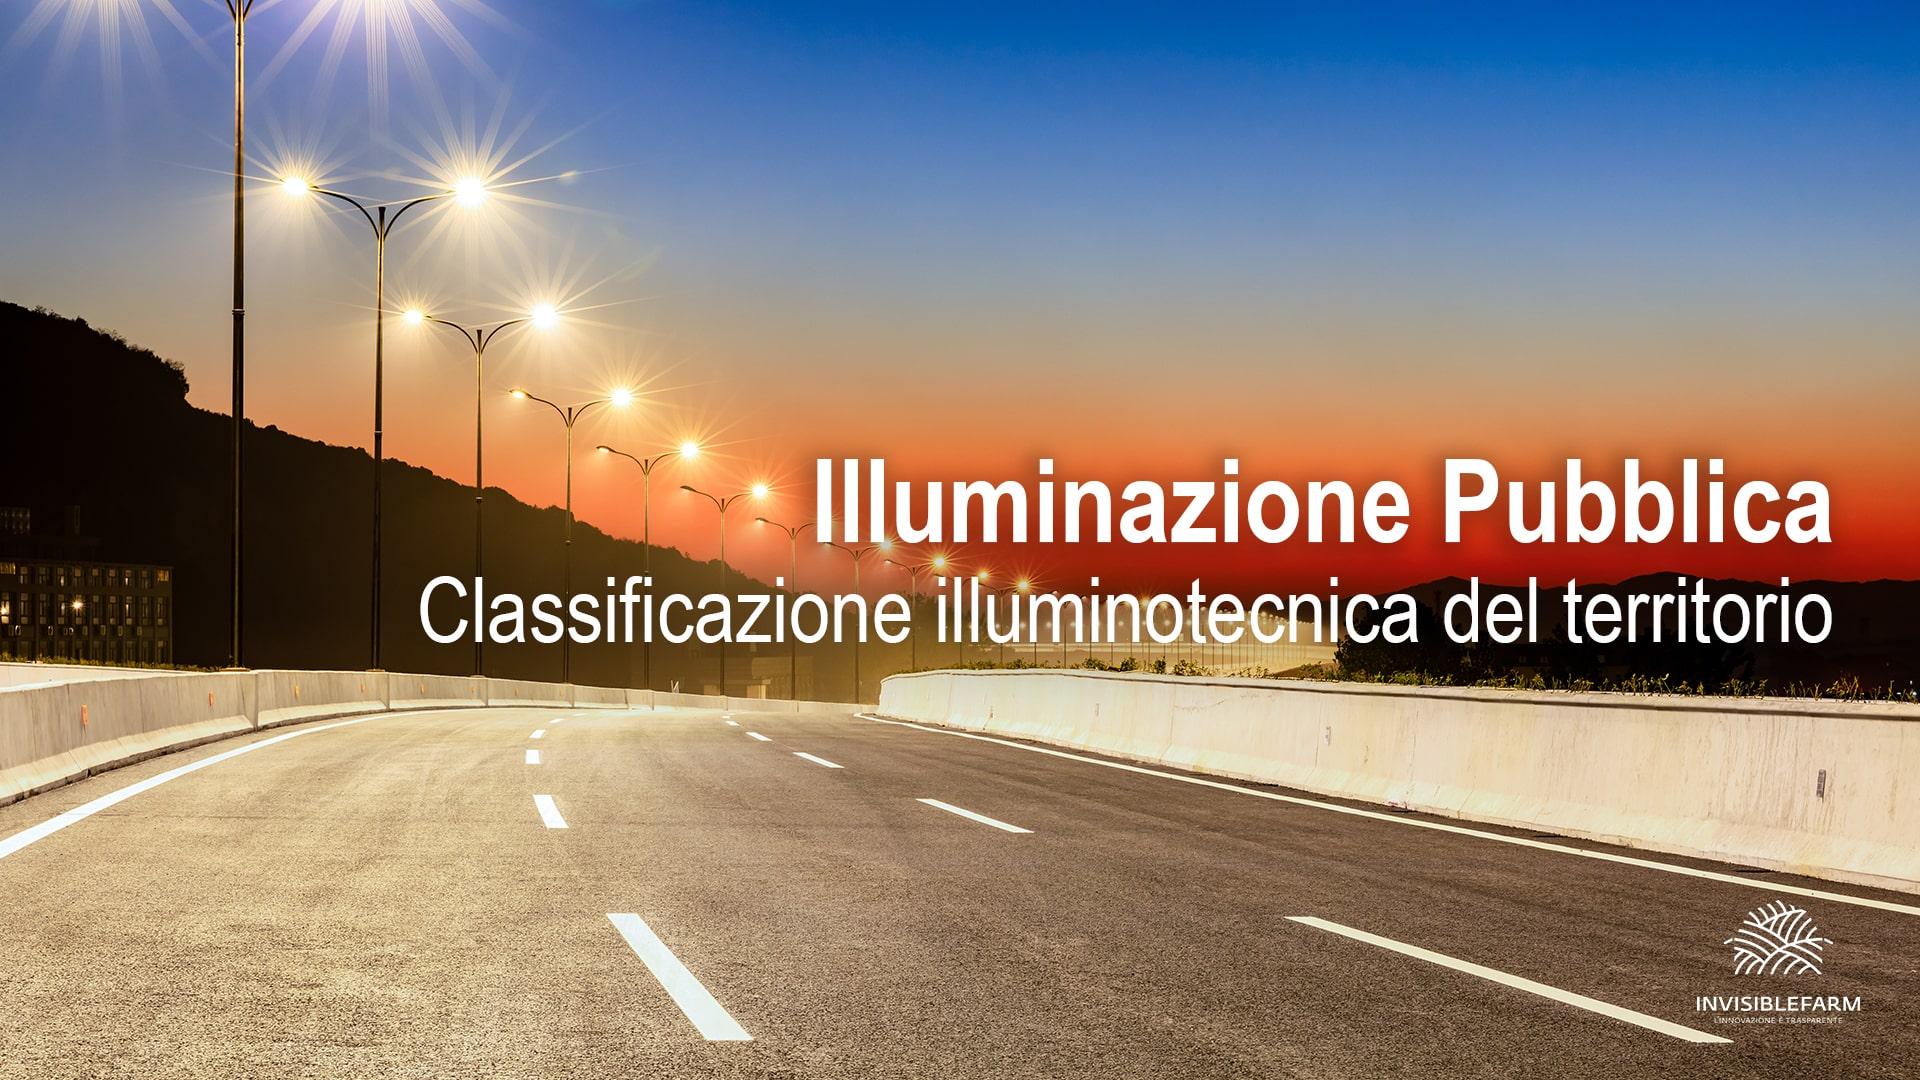 autostrada illuminata da lampioni